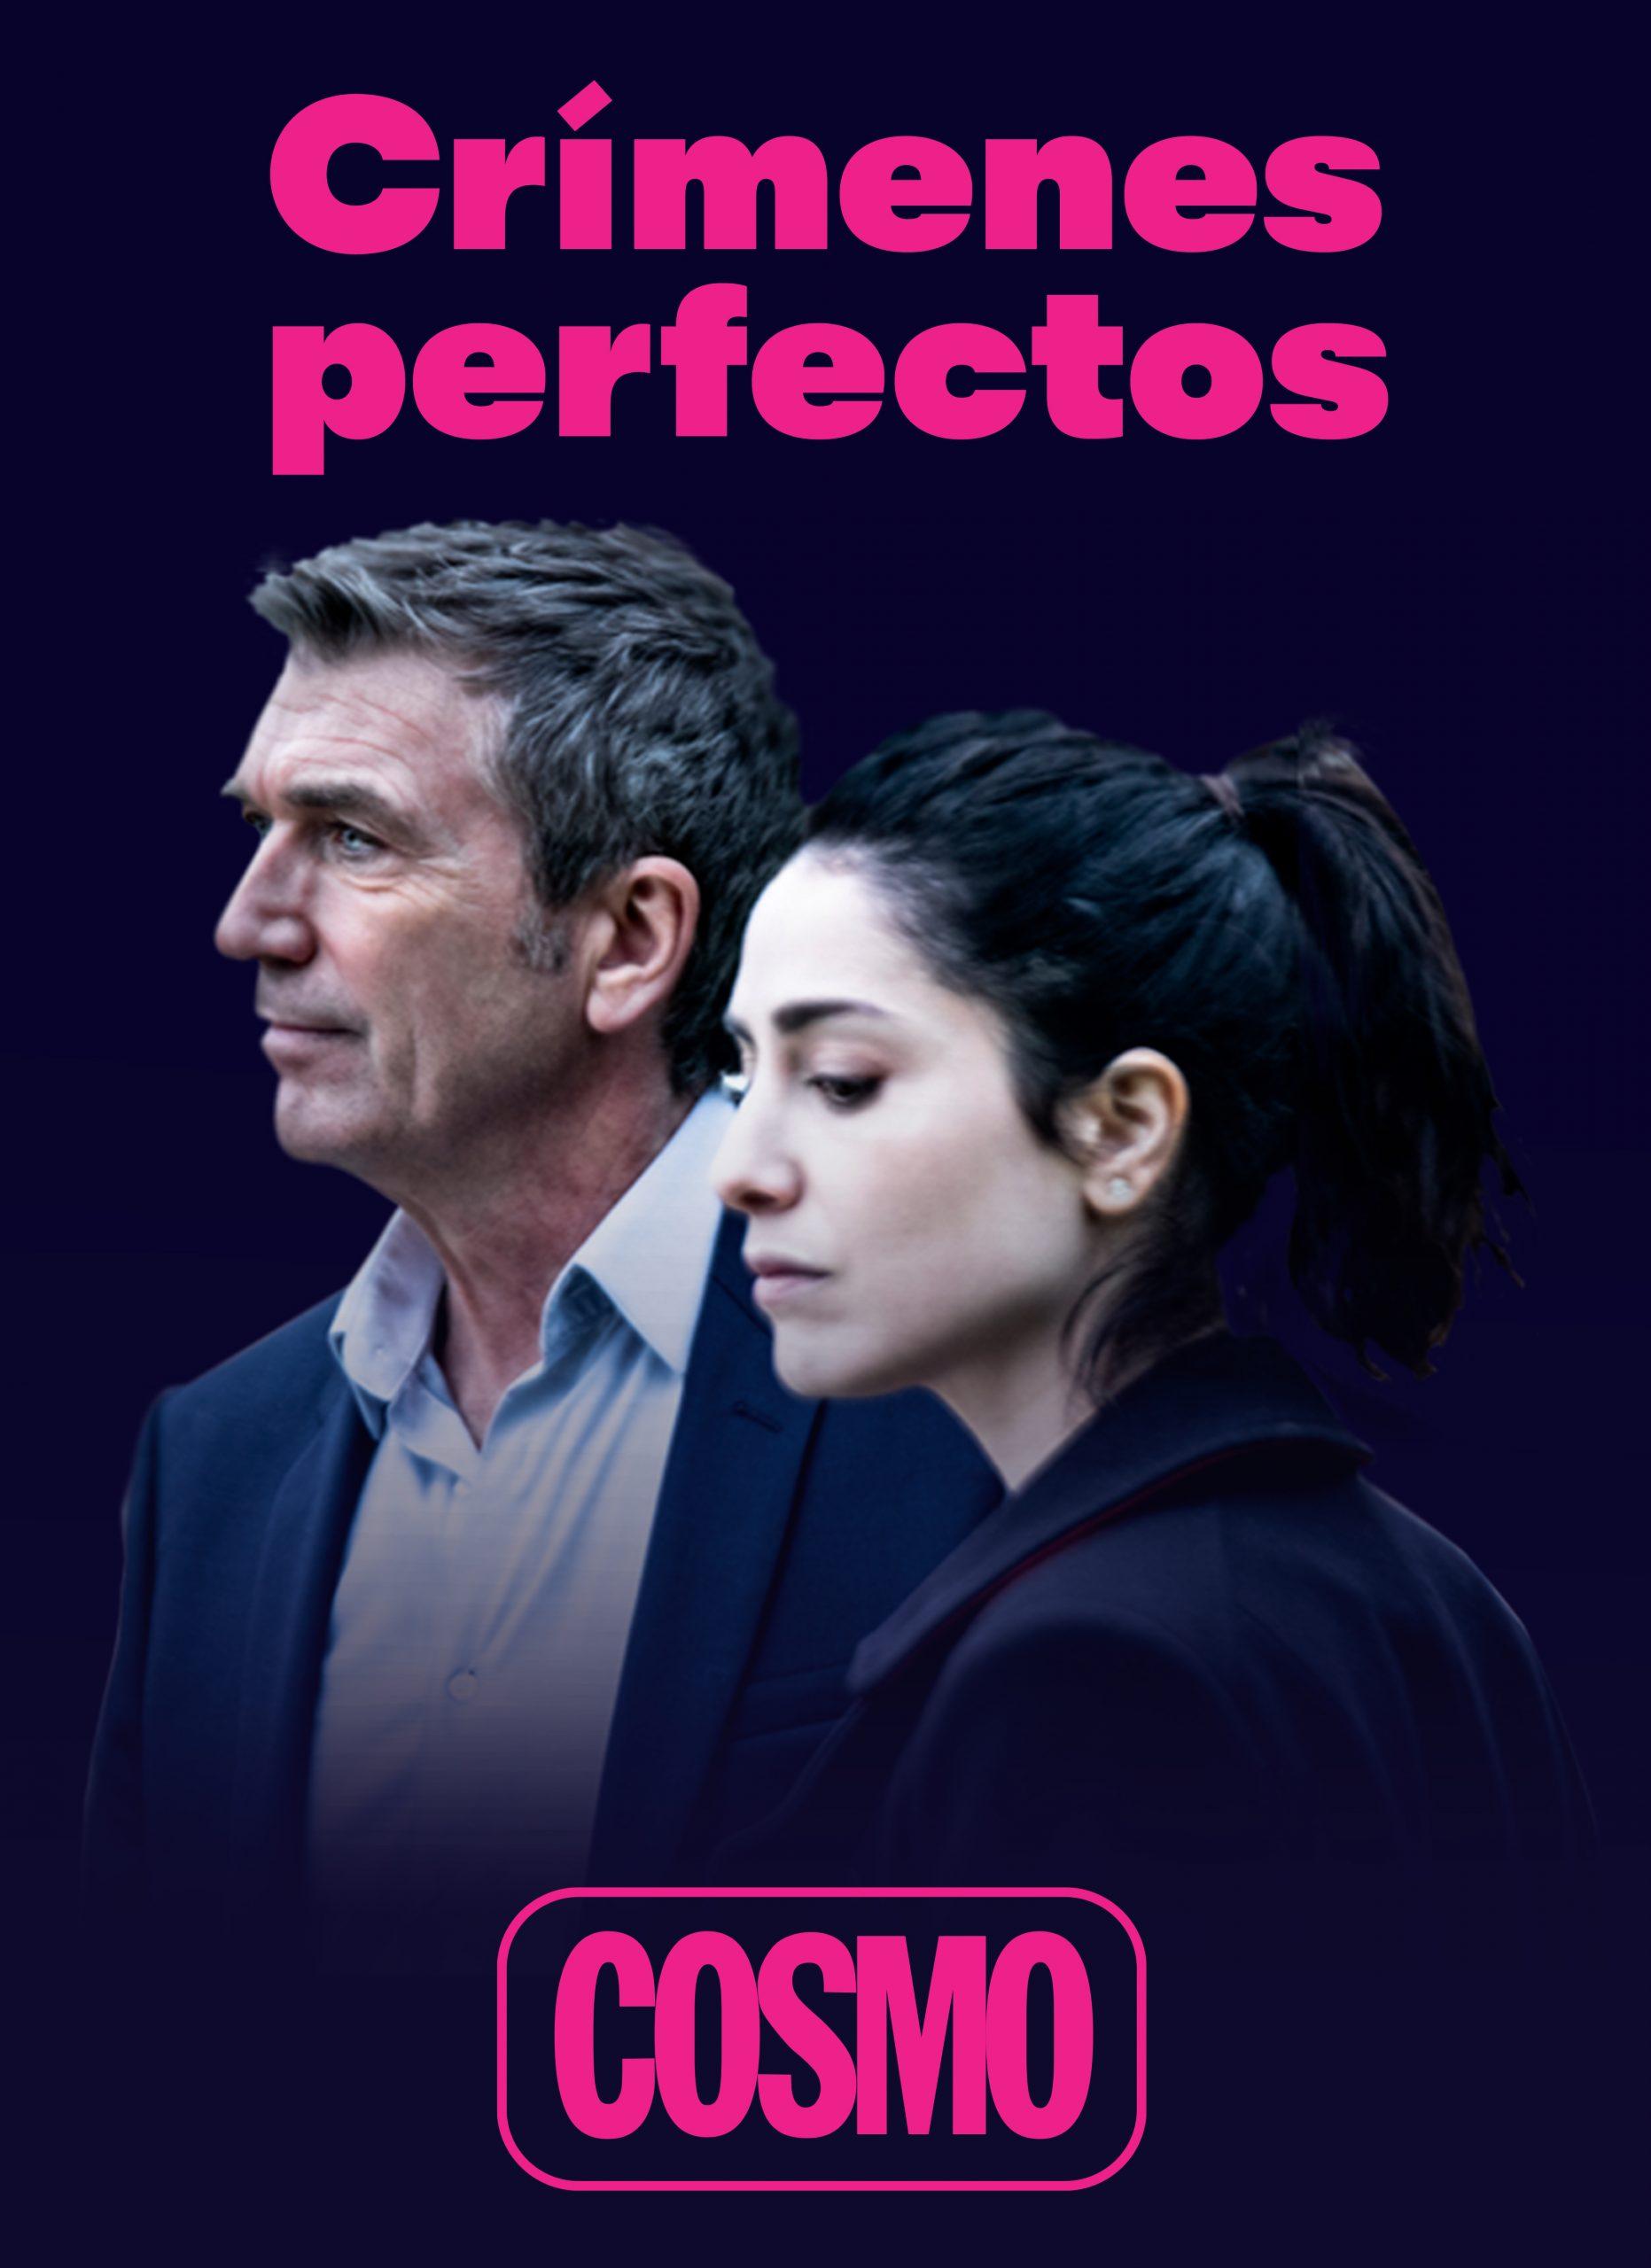 Crímenesperfectos